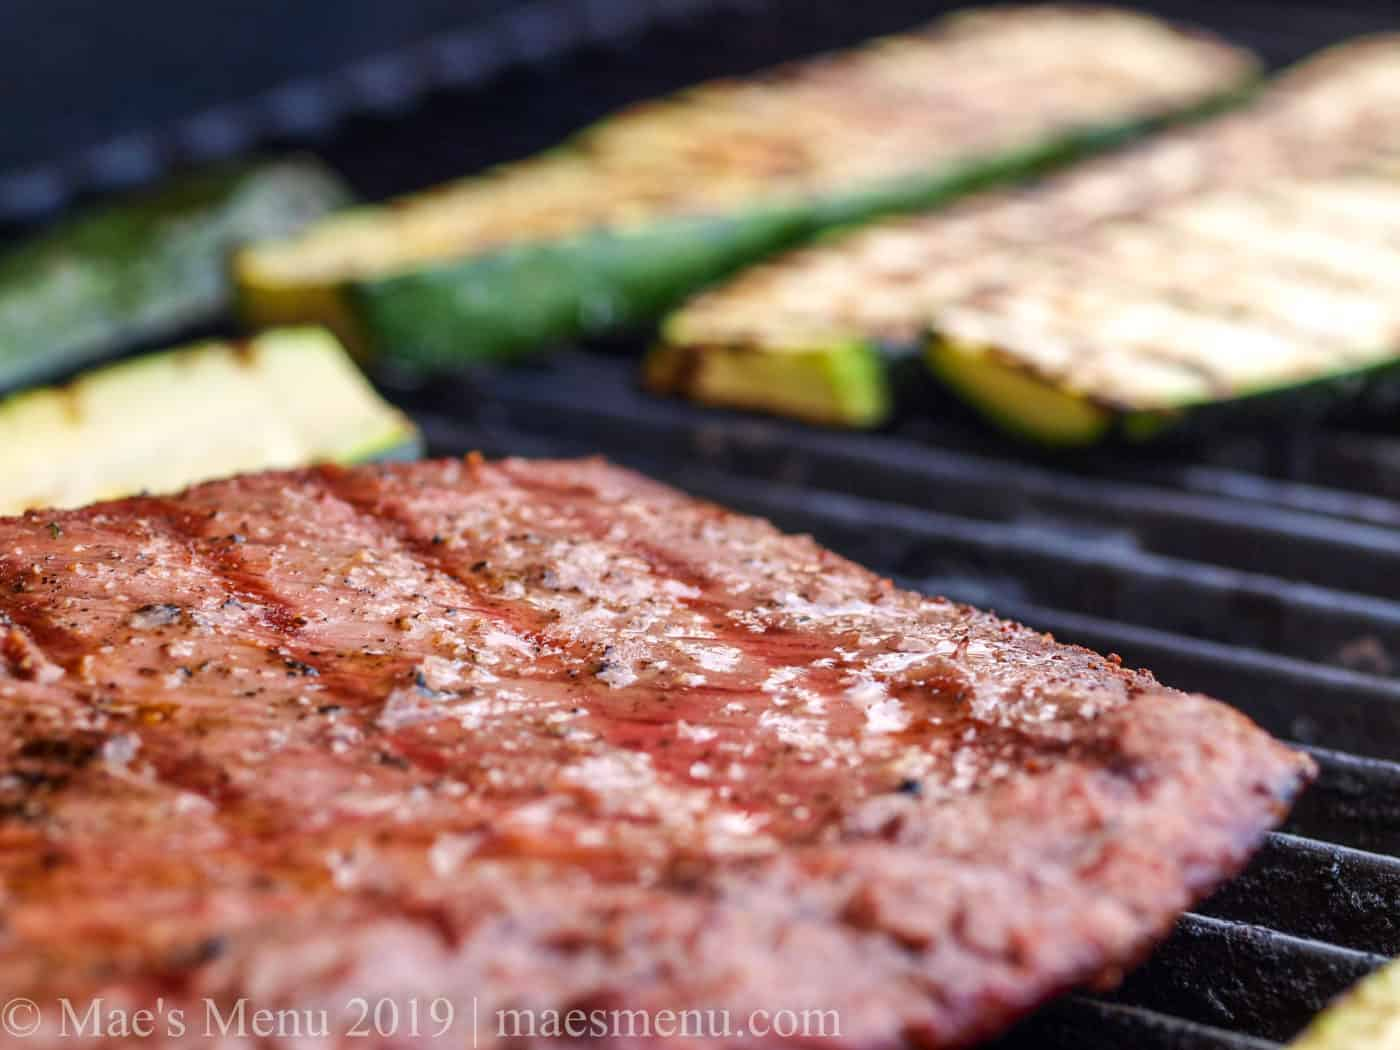 Grilling steak and zucchini.